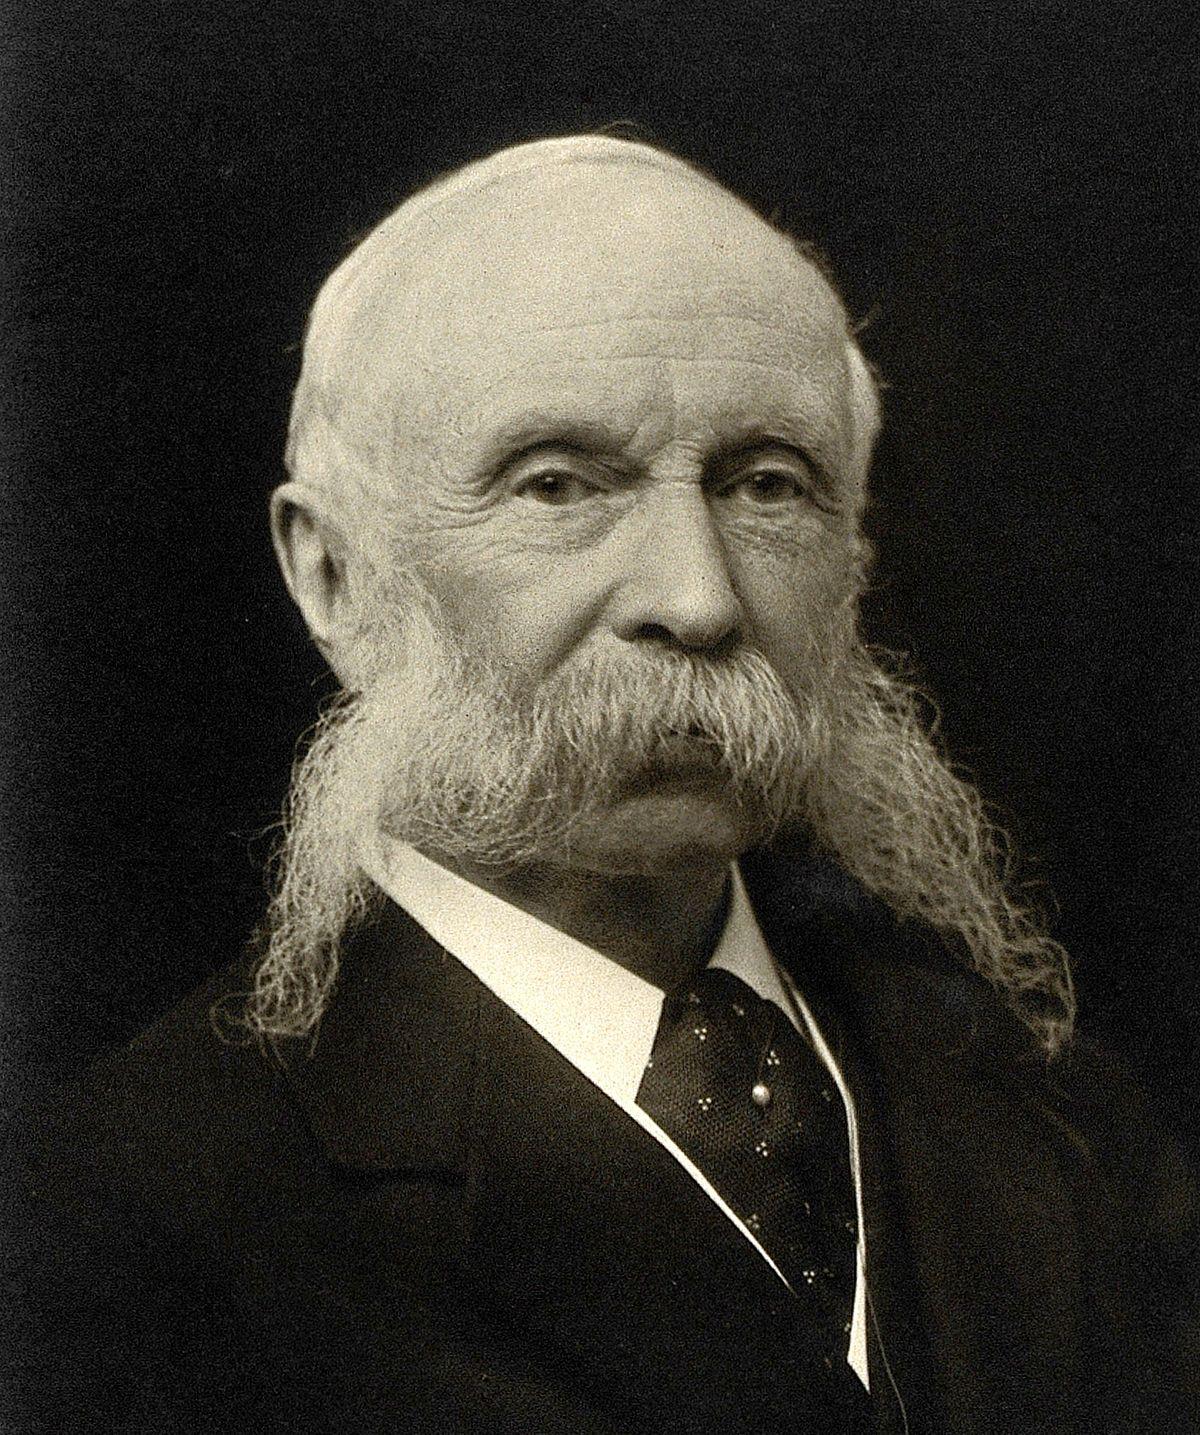 James Crichton Browne Wikipedia